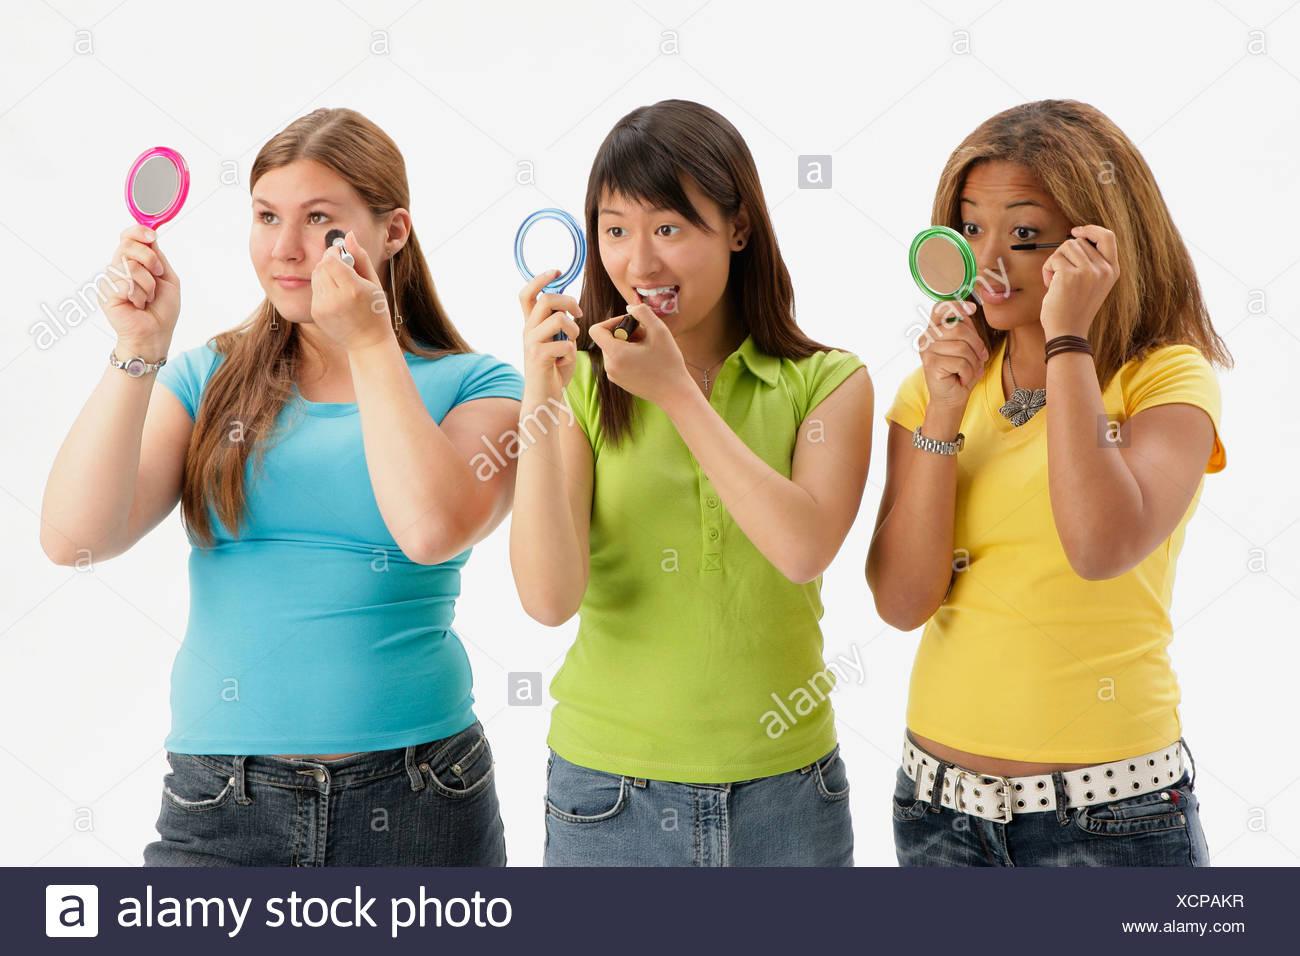 Three teens applying makeup - Stock Image